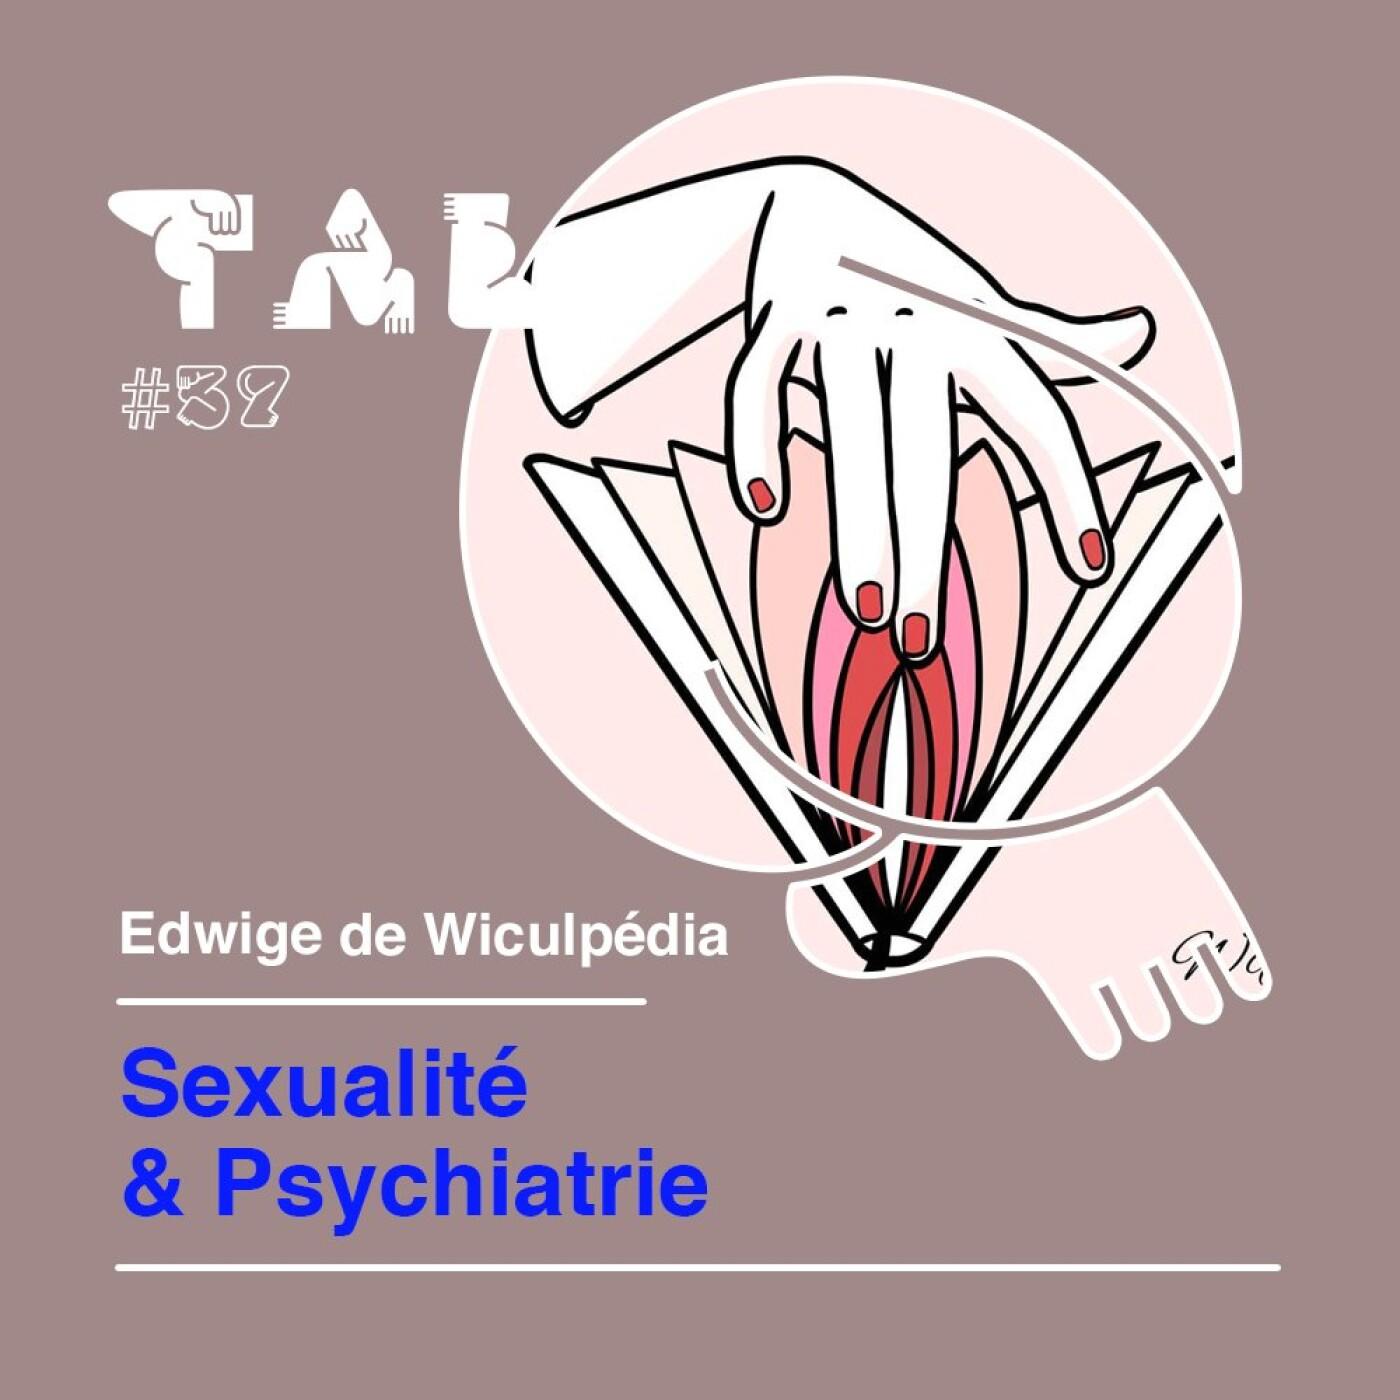 #37 - Edwige de Wiculpedia : Sexualité et Psychiatrie